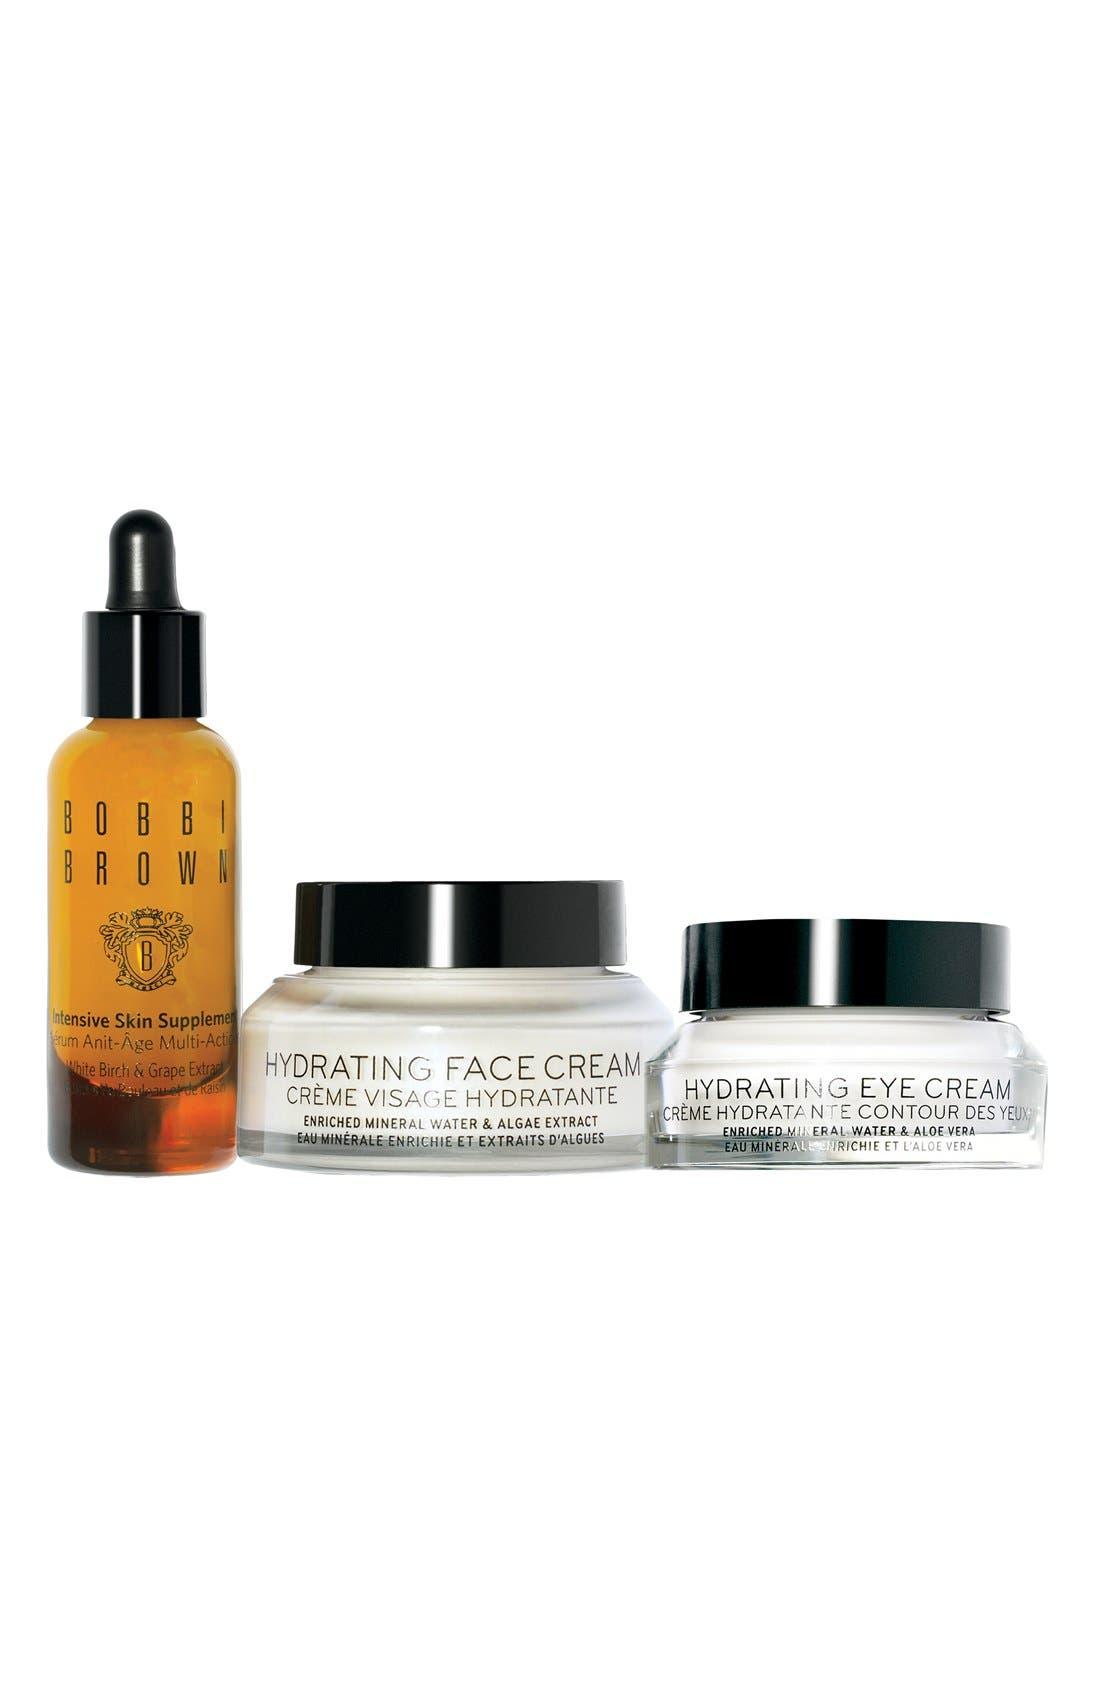 BOBBI BROWN,                             'Hydrating Skin Supplements' Set,                             Alternate thumbnail 2, color,                             000